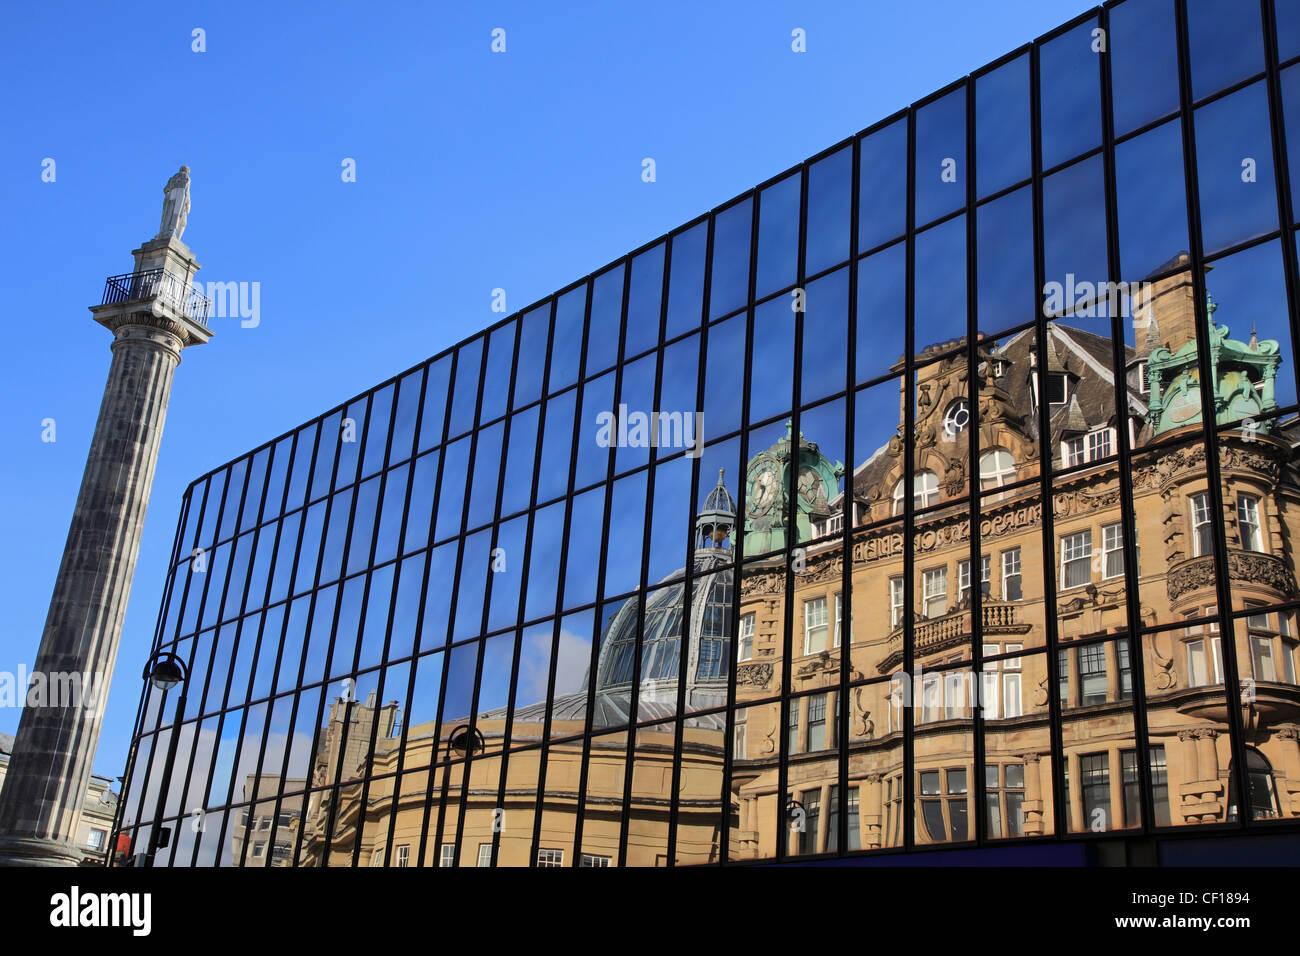 greys-monument-and-buildings-reflected-in-windows-blackett-street-CF1894.jpg